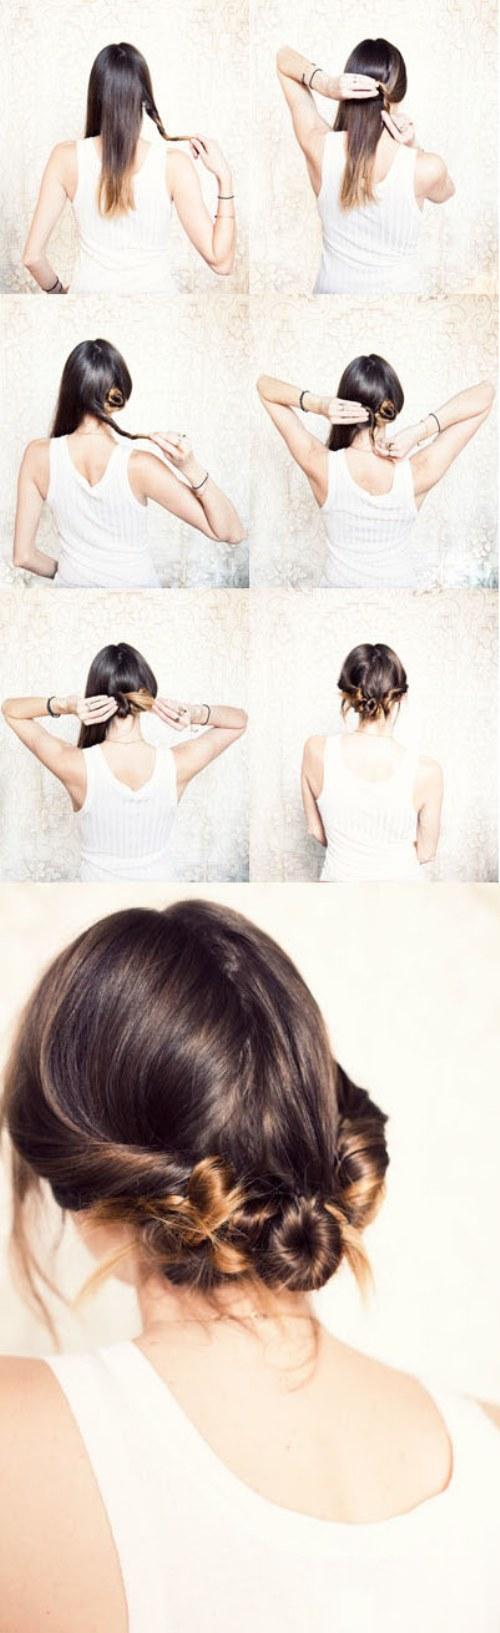 tutoriales peinados lindos